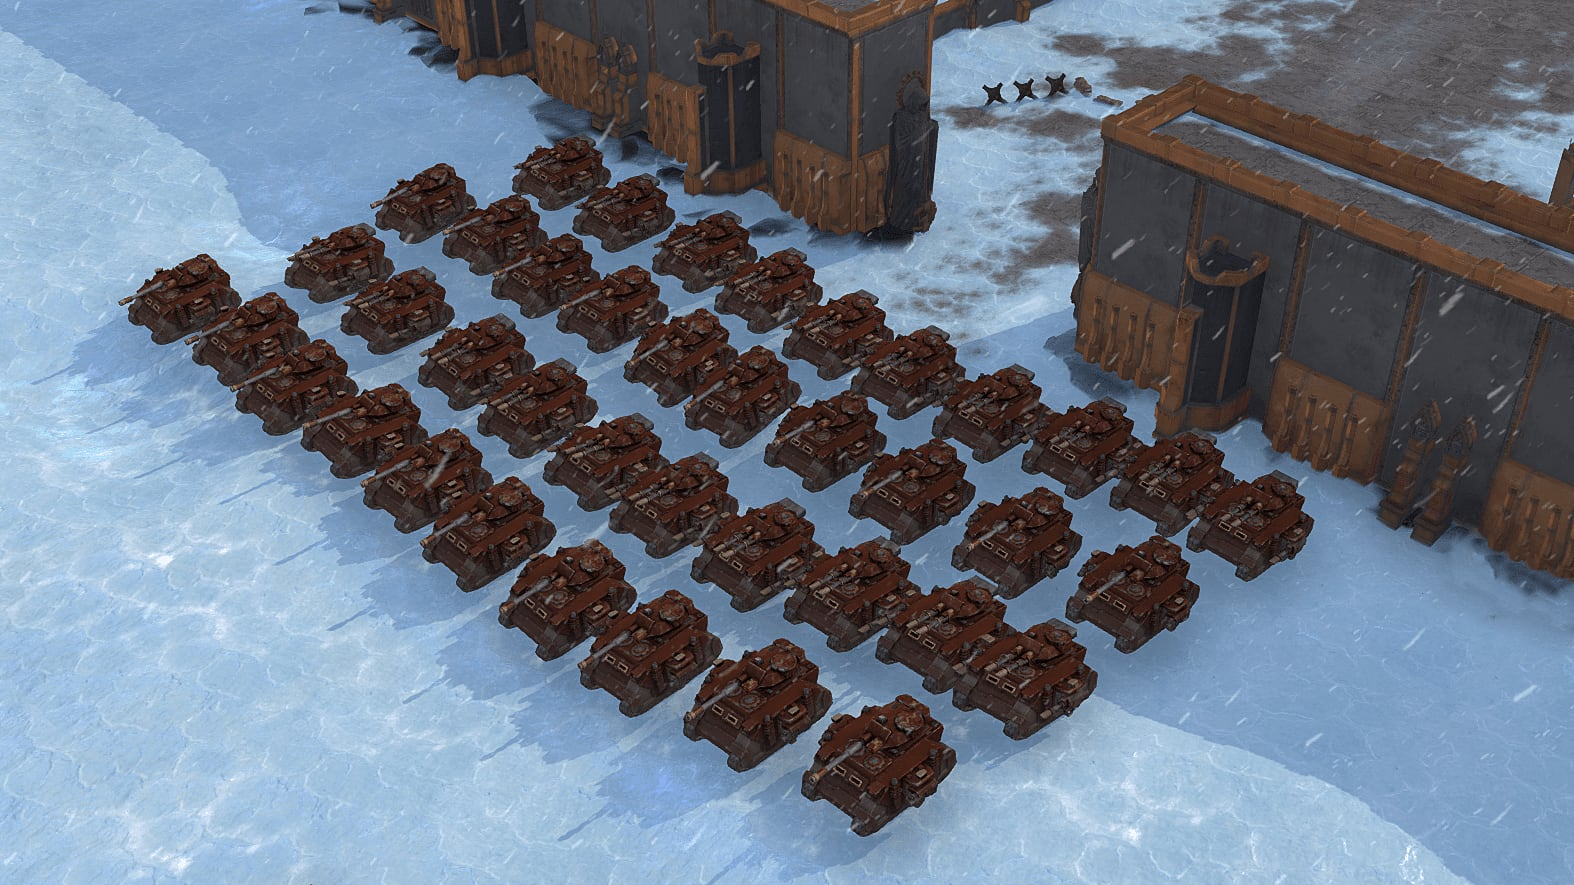 Best Steam Workshop Mods To Download For Dawn Of War Iii Warhammer Hacks And Computer Case 40k Overpowered Elites